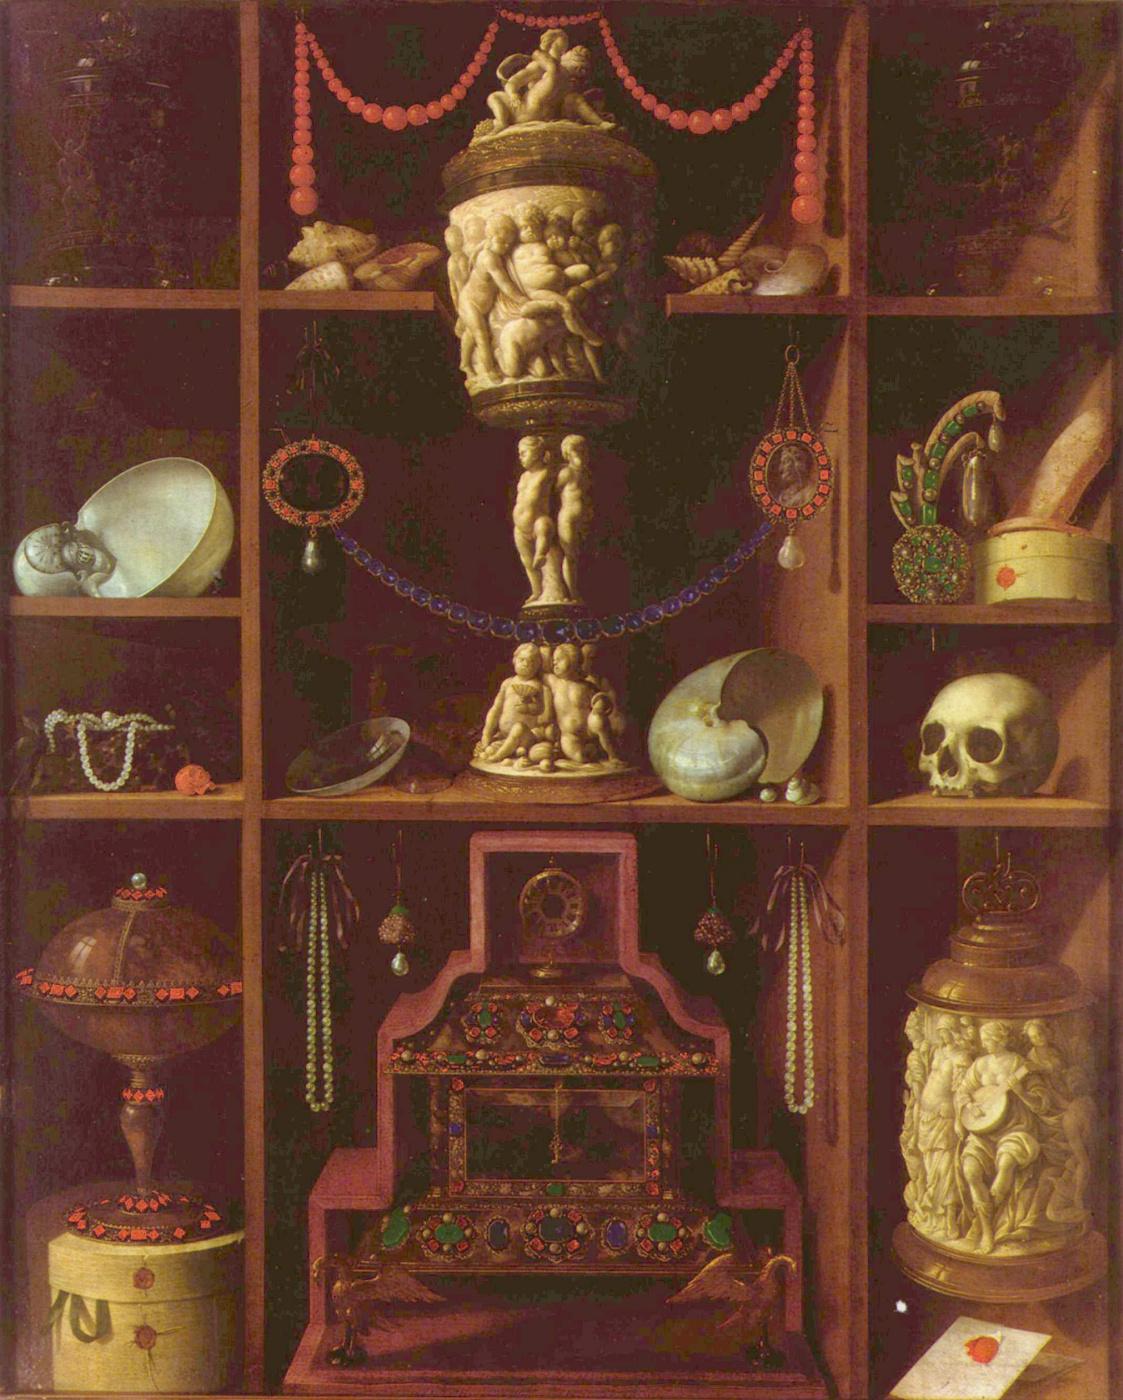 Johann Georg Heinz. Wardrobe treasure